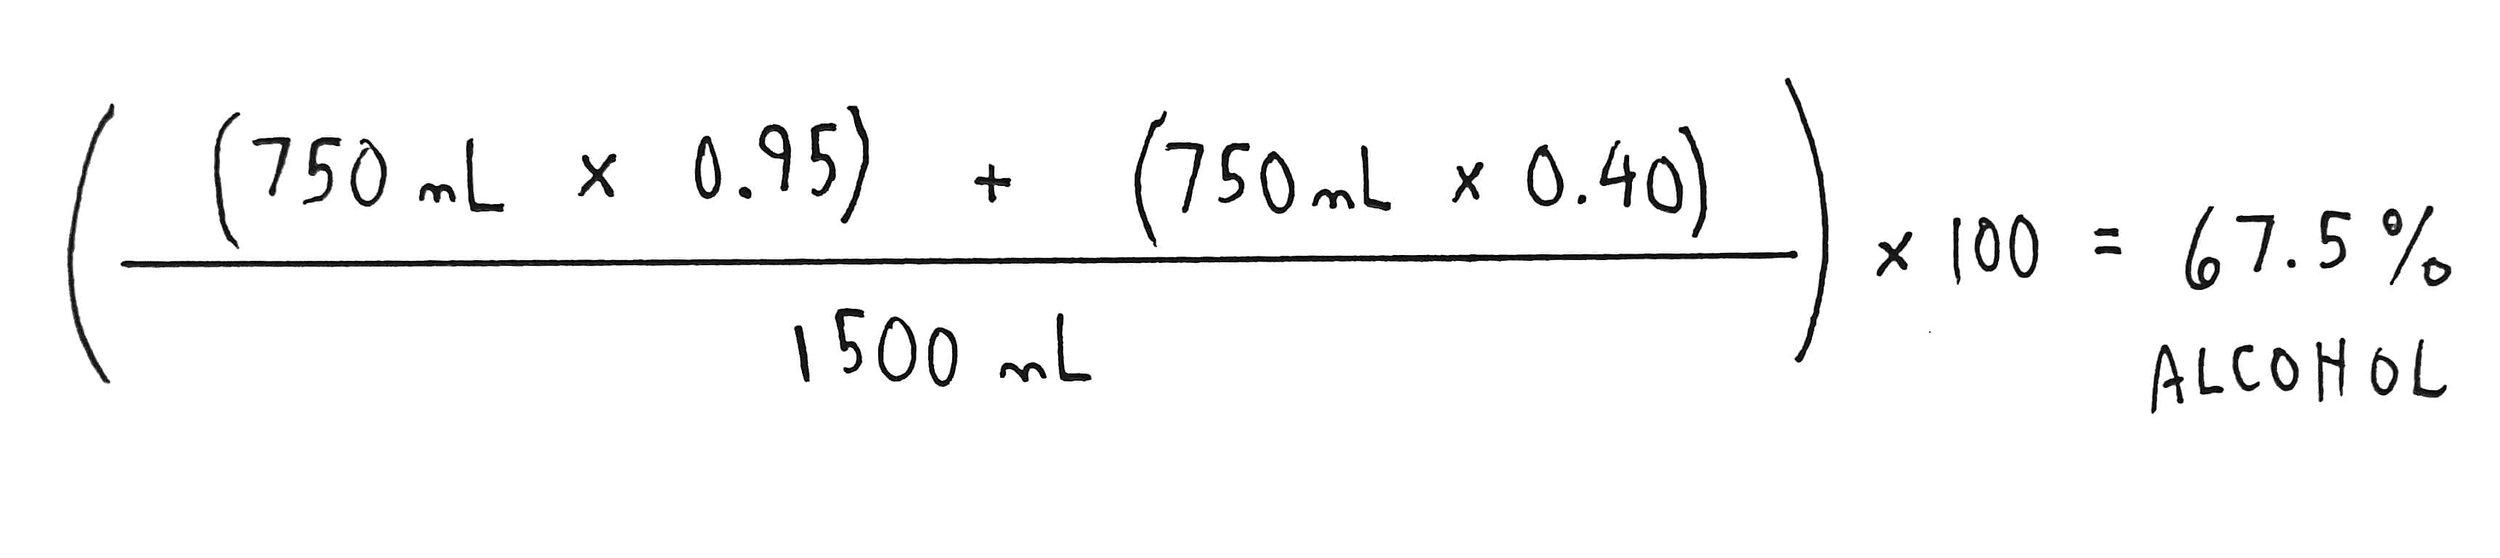 Portland-florist-event-stylist-equation-2